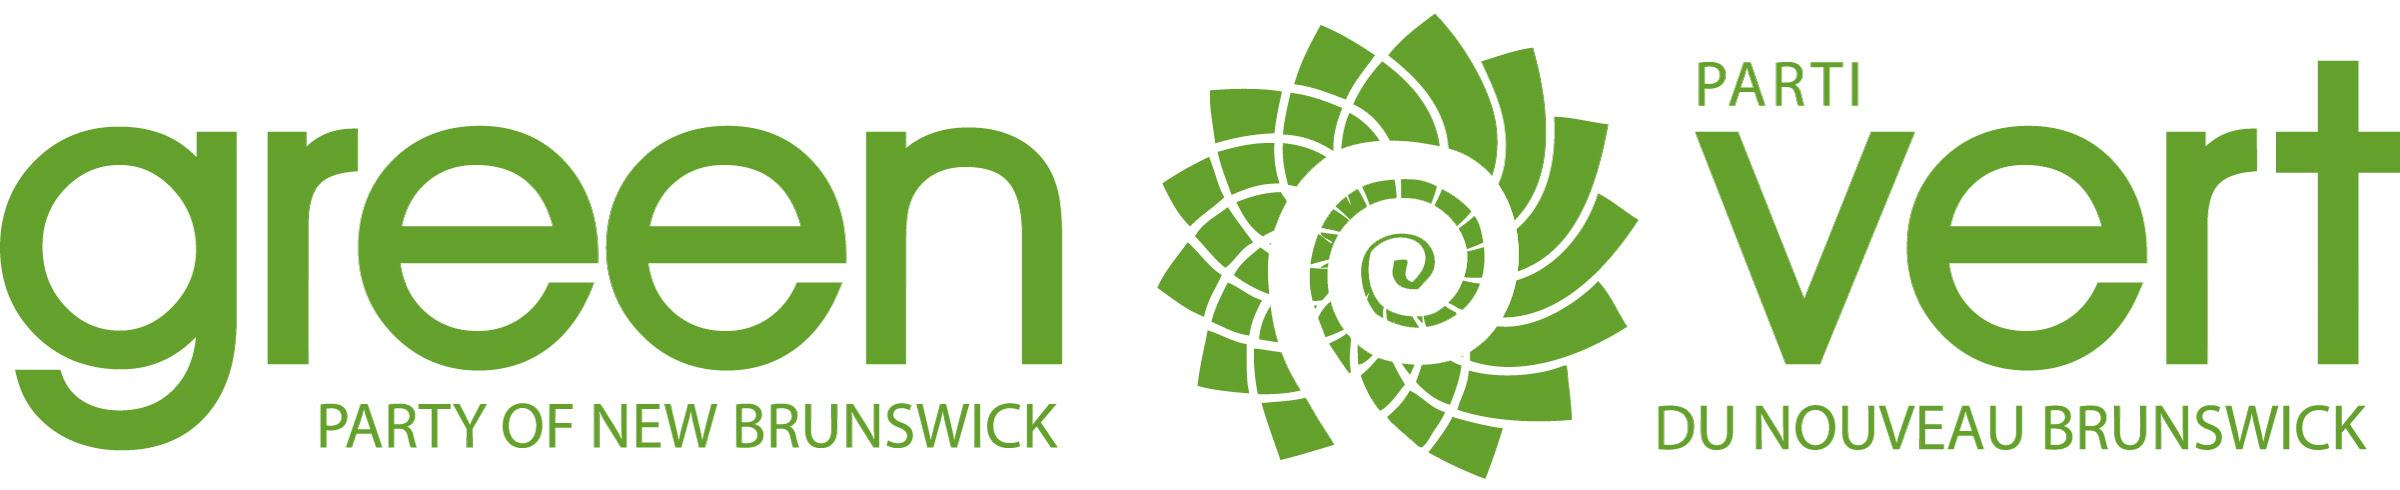 GPNB_logo.jpg